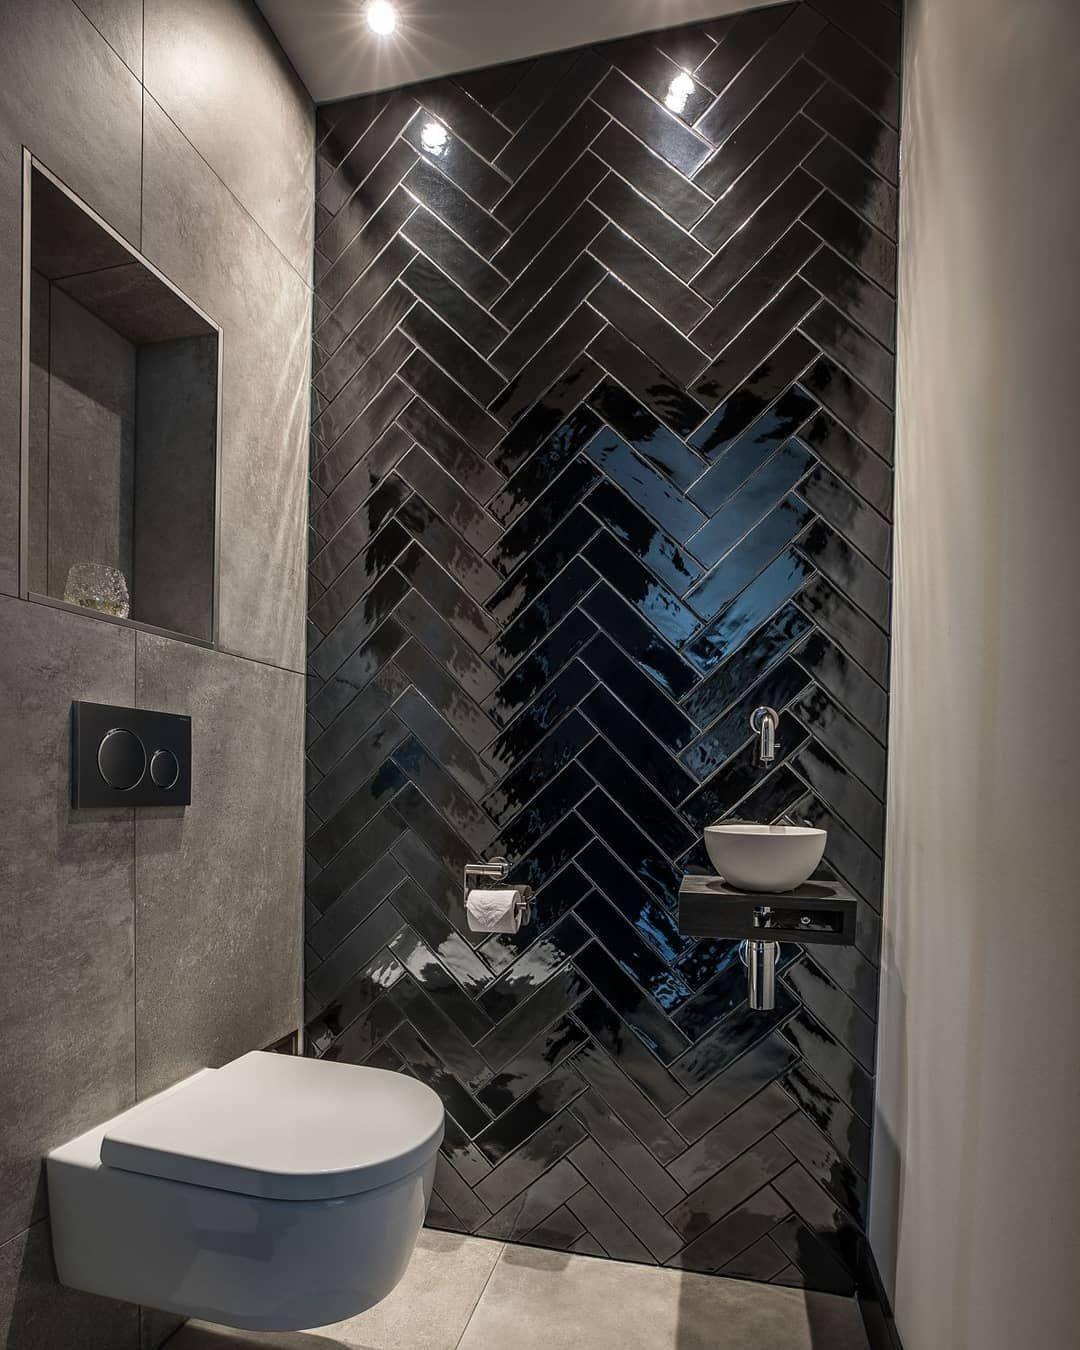 Schone Wand Toiletdesign Toilet Toiletinspiration House